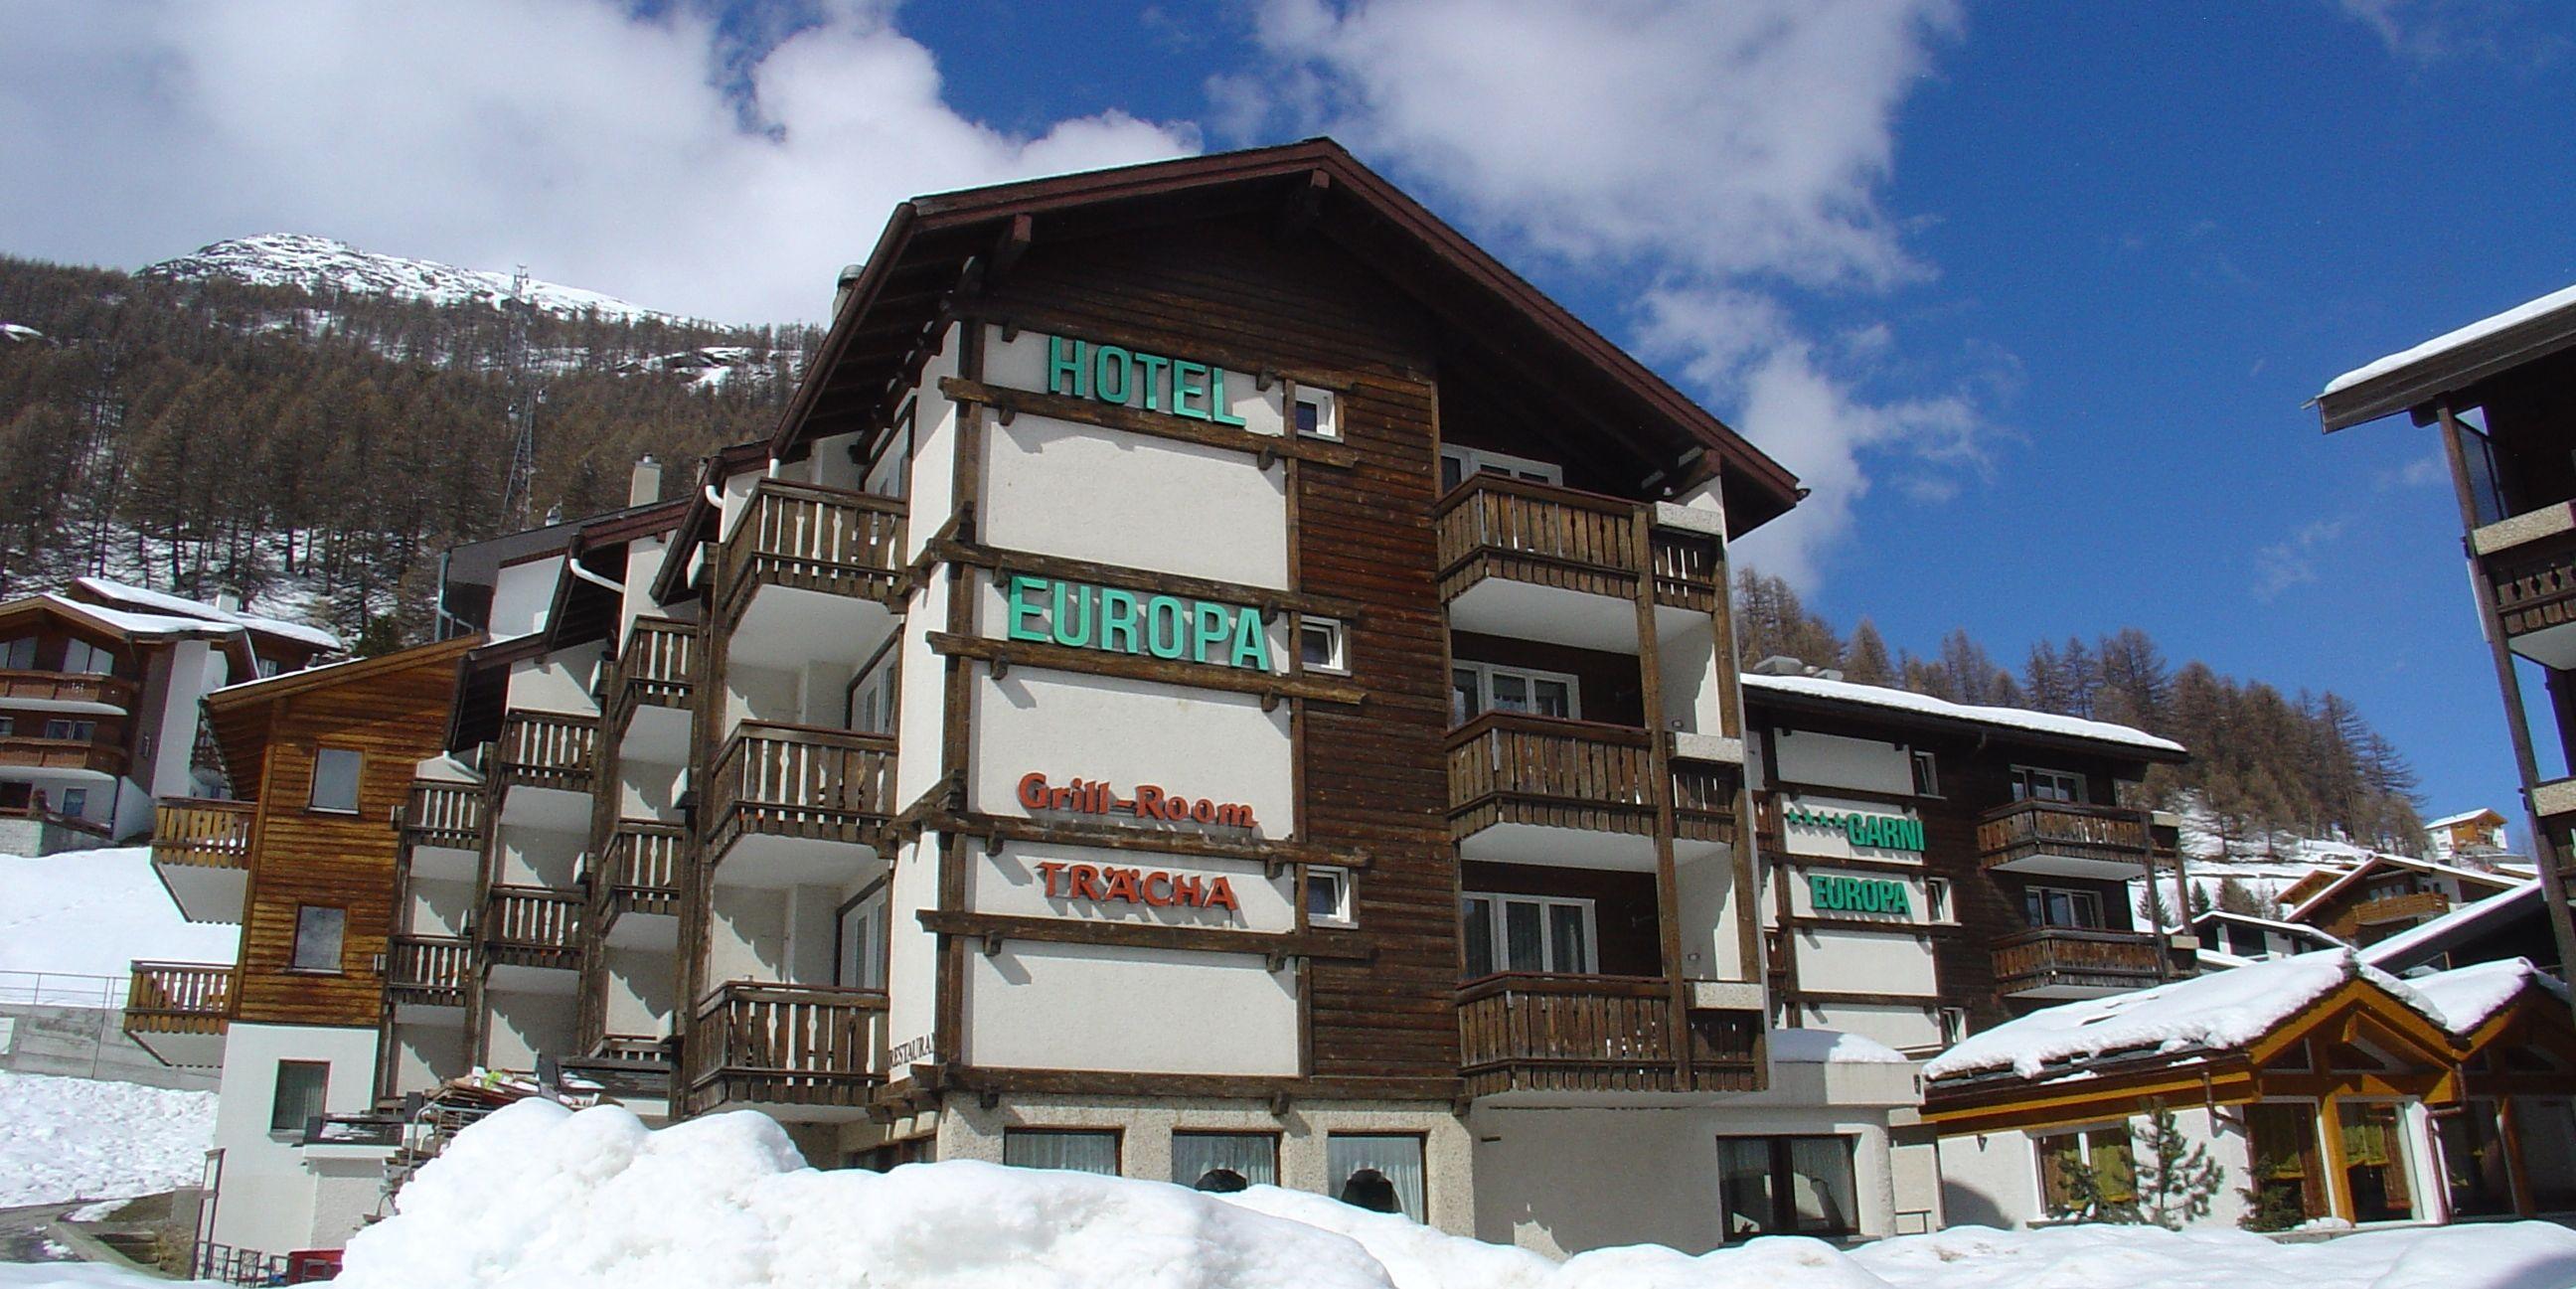 Hotel Europa - Free Republic of Holidays Saas-Fee